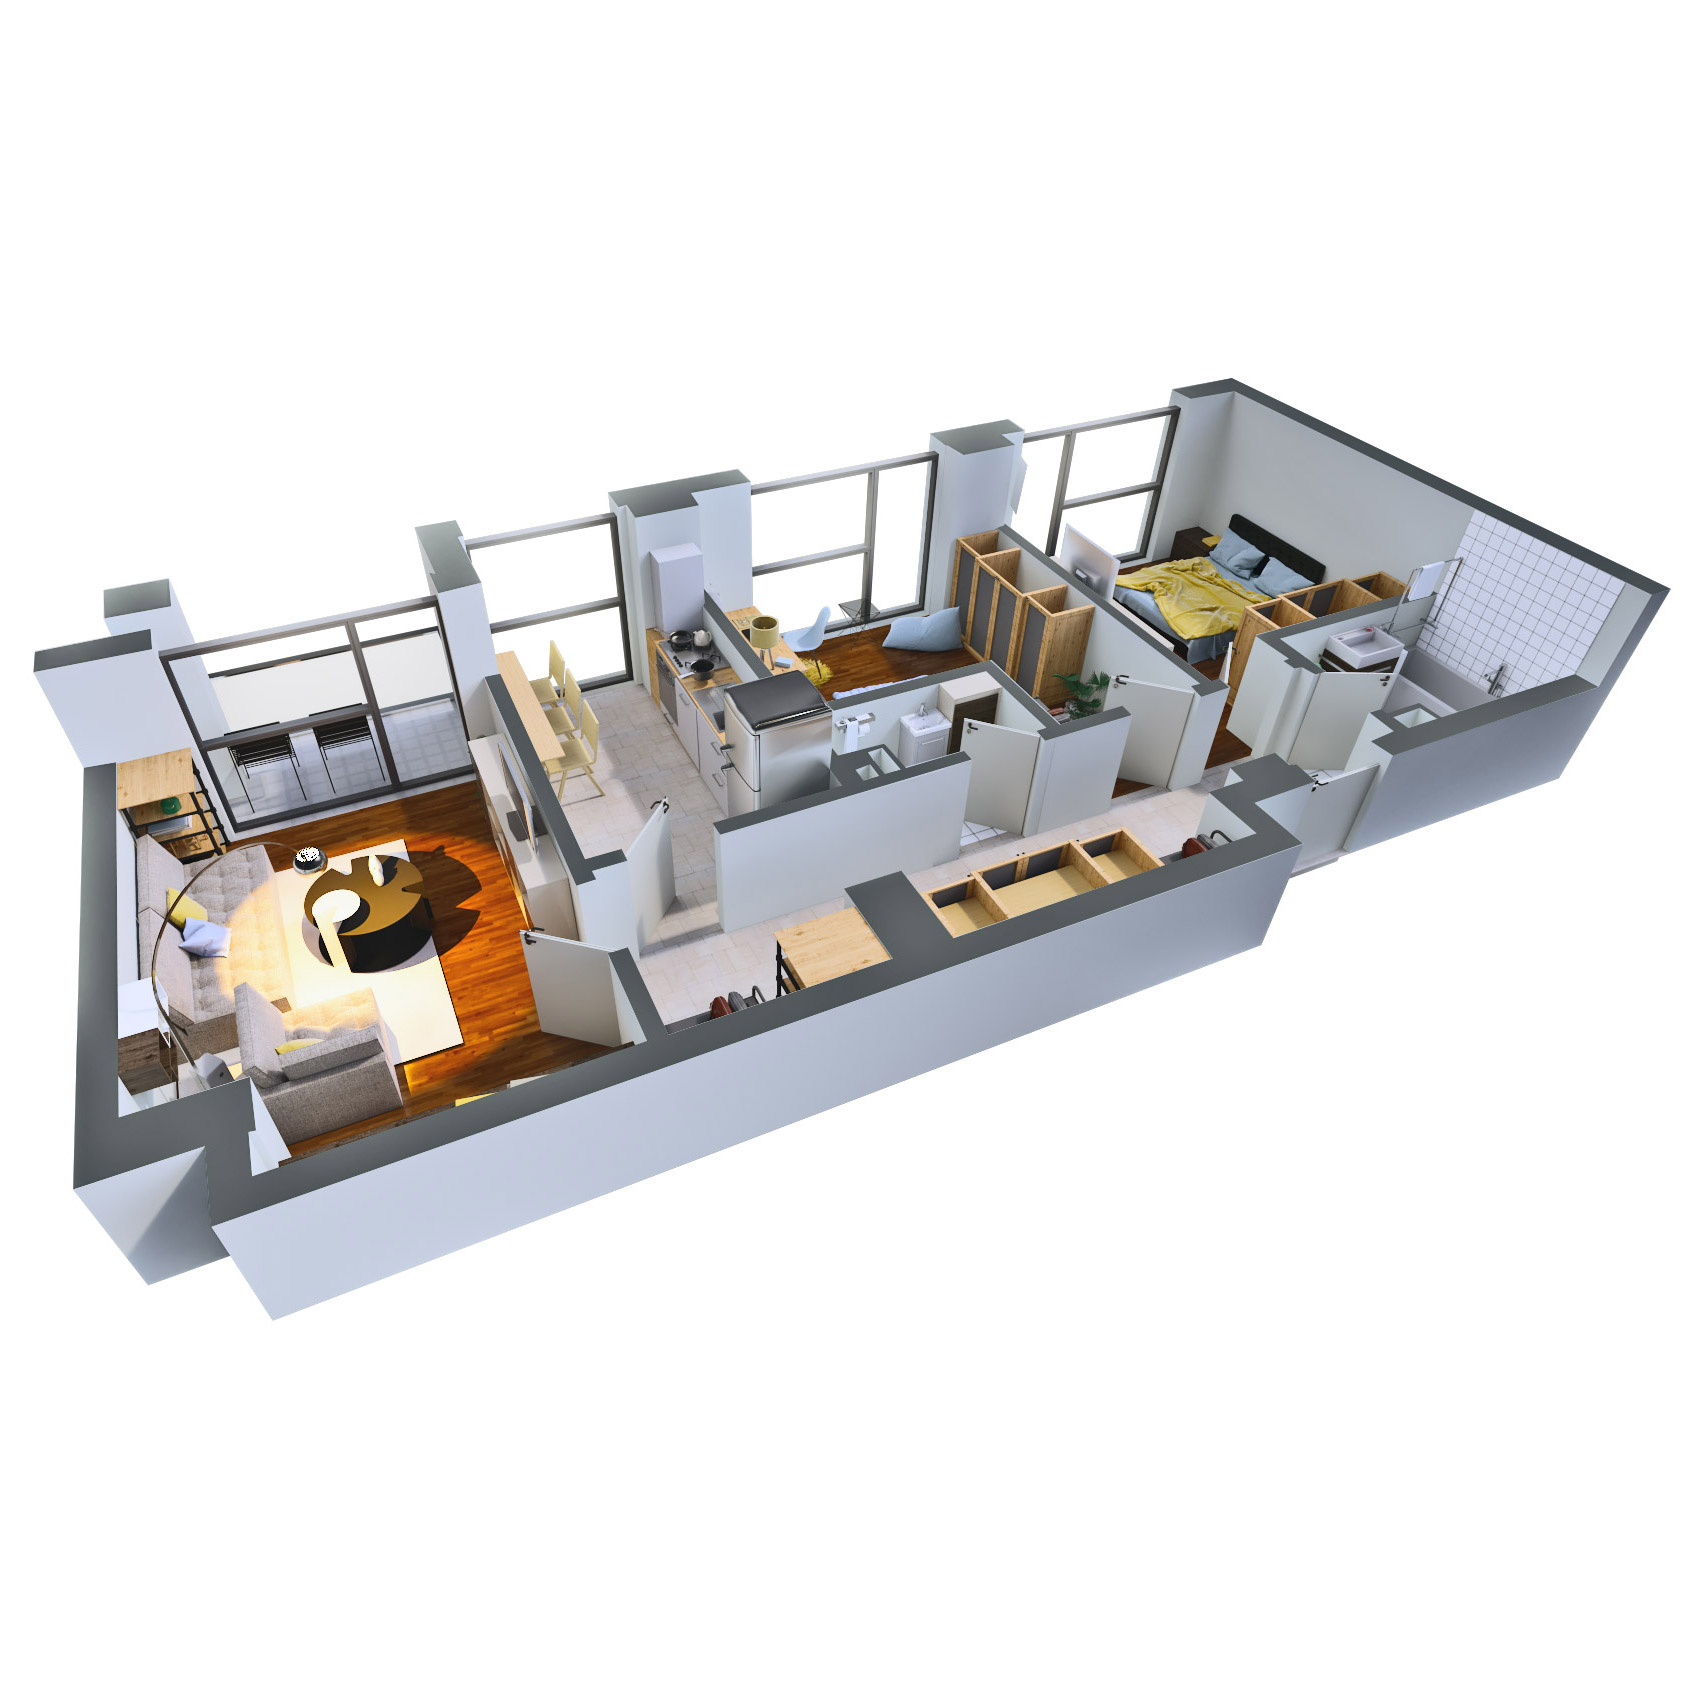 Apartament 3 camere de vanzare Bucuresti - Catedral Residence - Marriott, Piata Unirii, 13 Septembrie, Izvor - Tip 2 - T2A - D